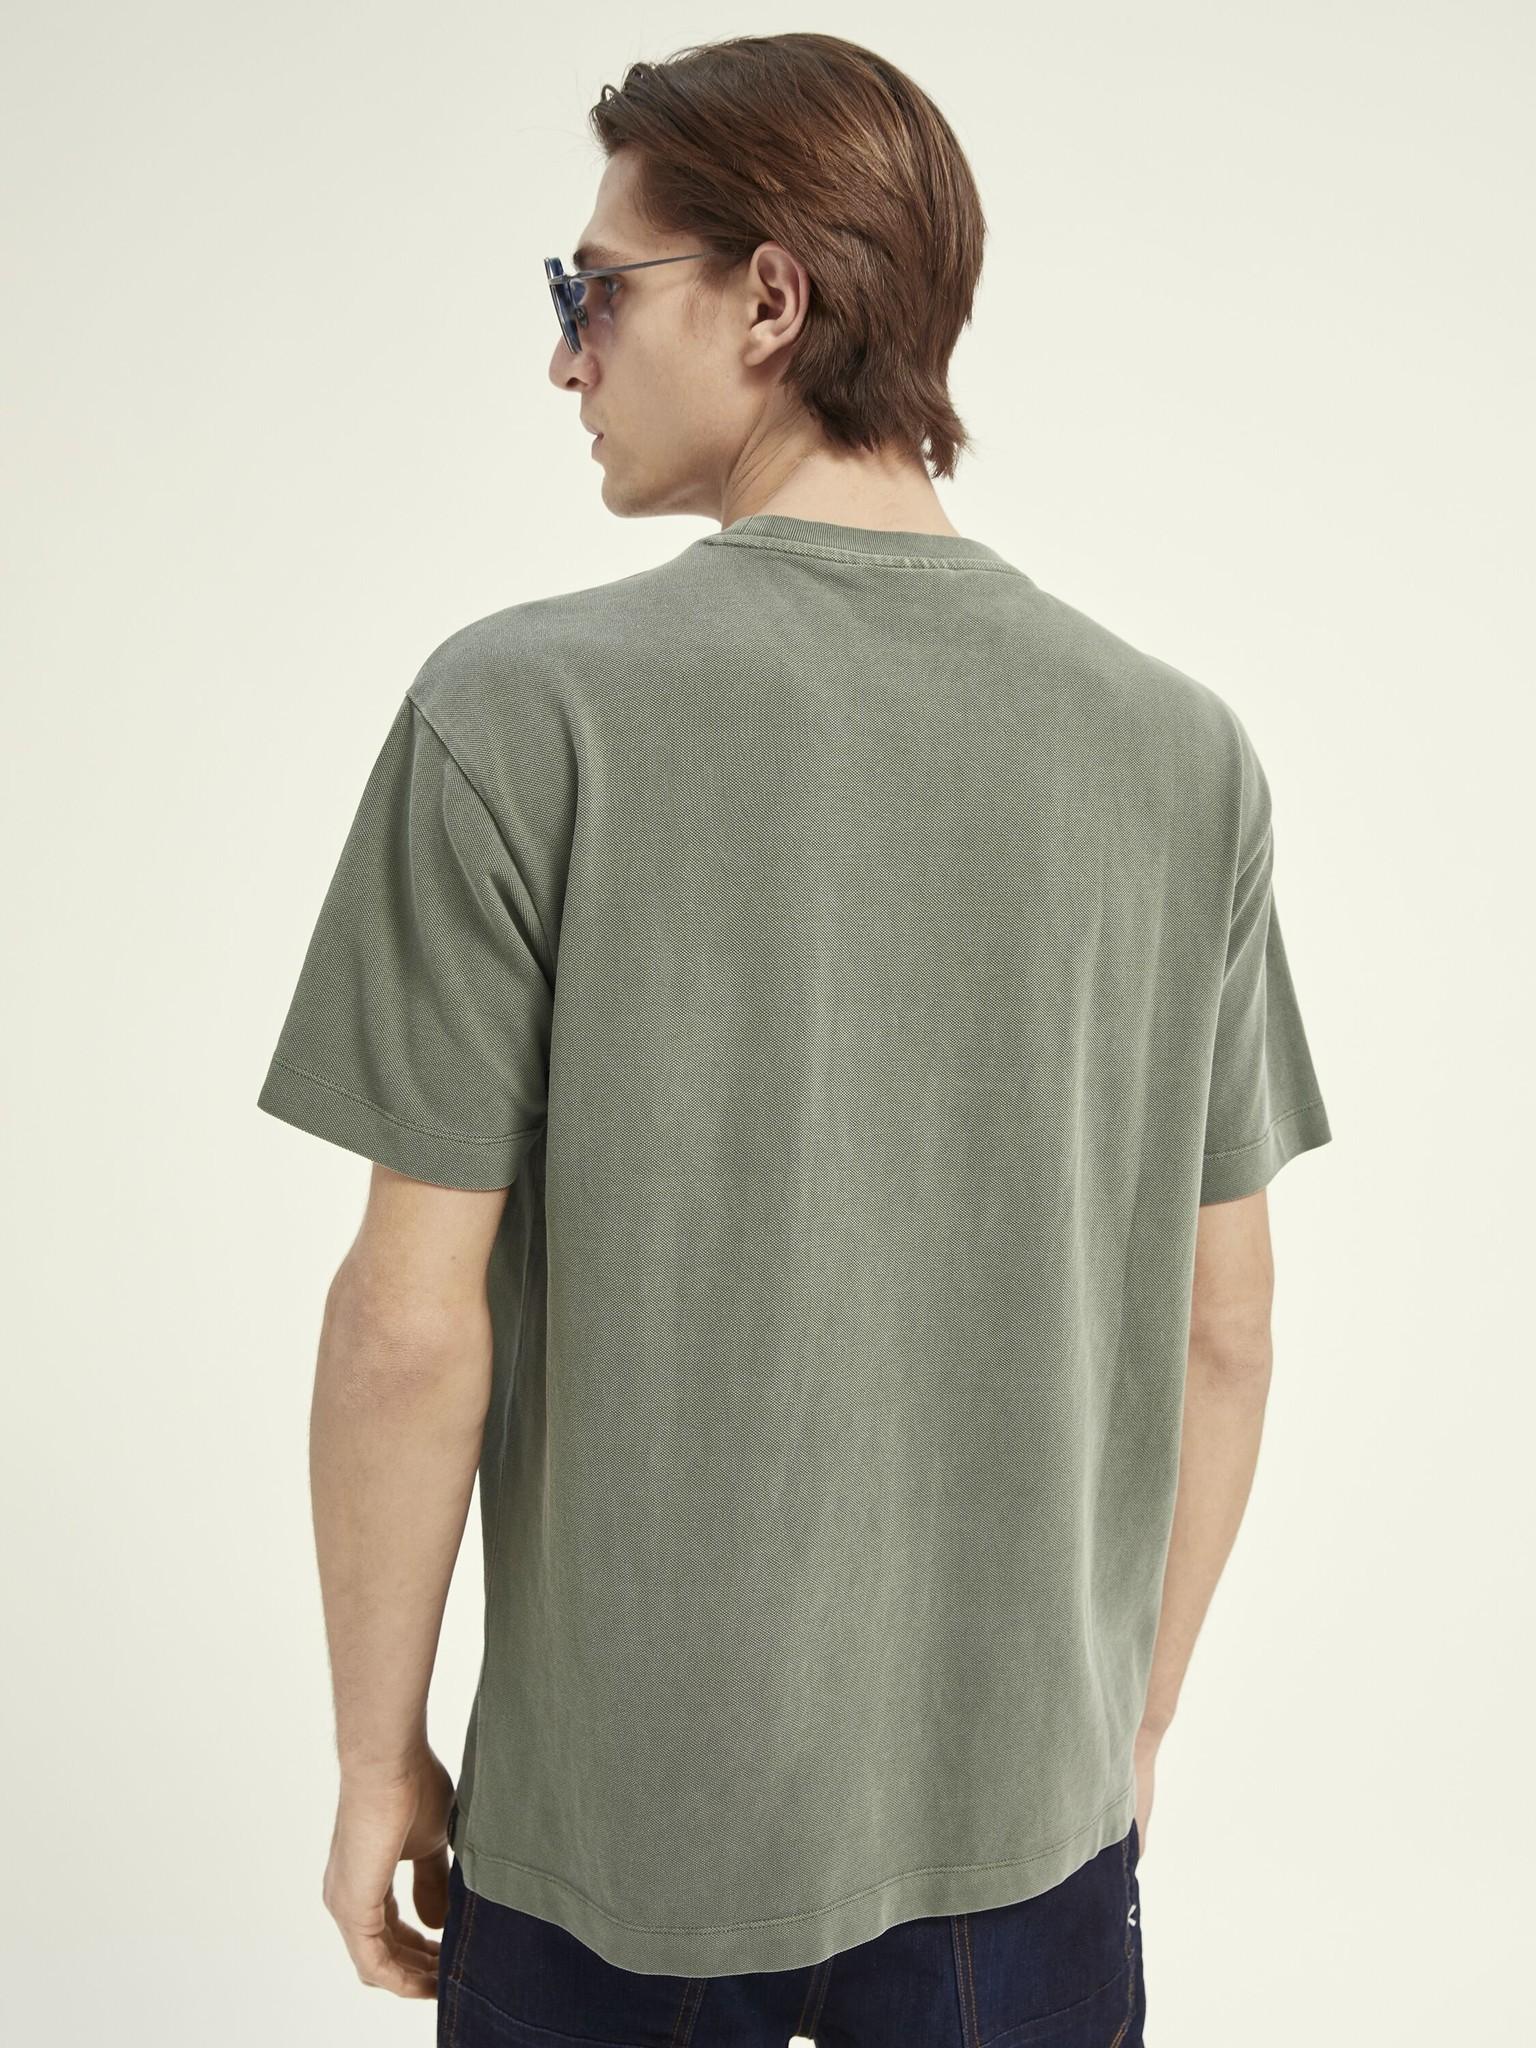 Scotch & Soda T-shirt Scotch & Soda 160846-0115